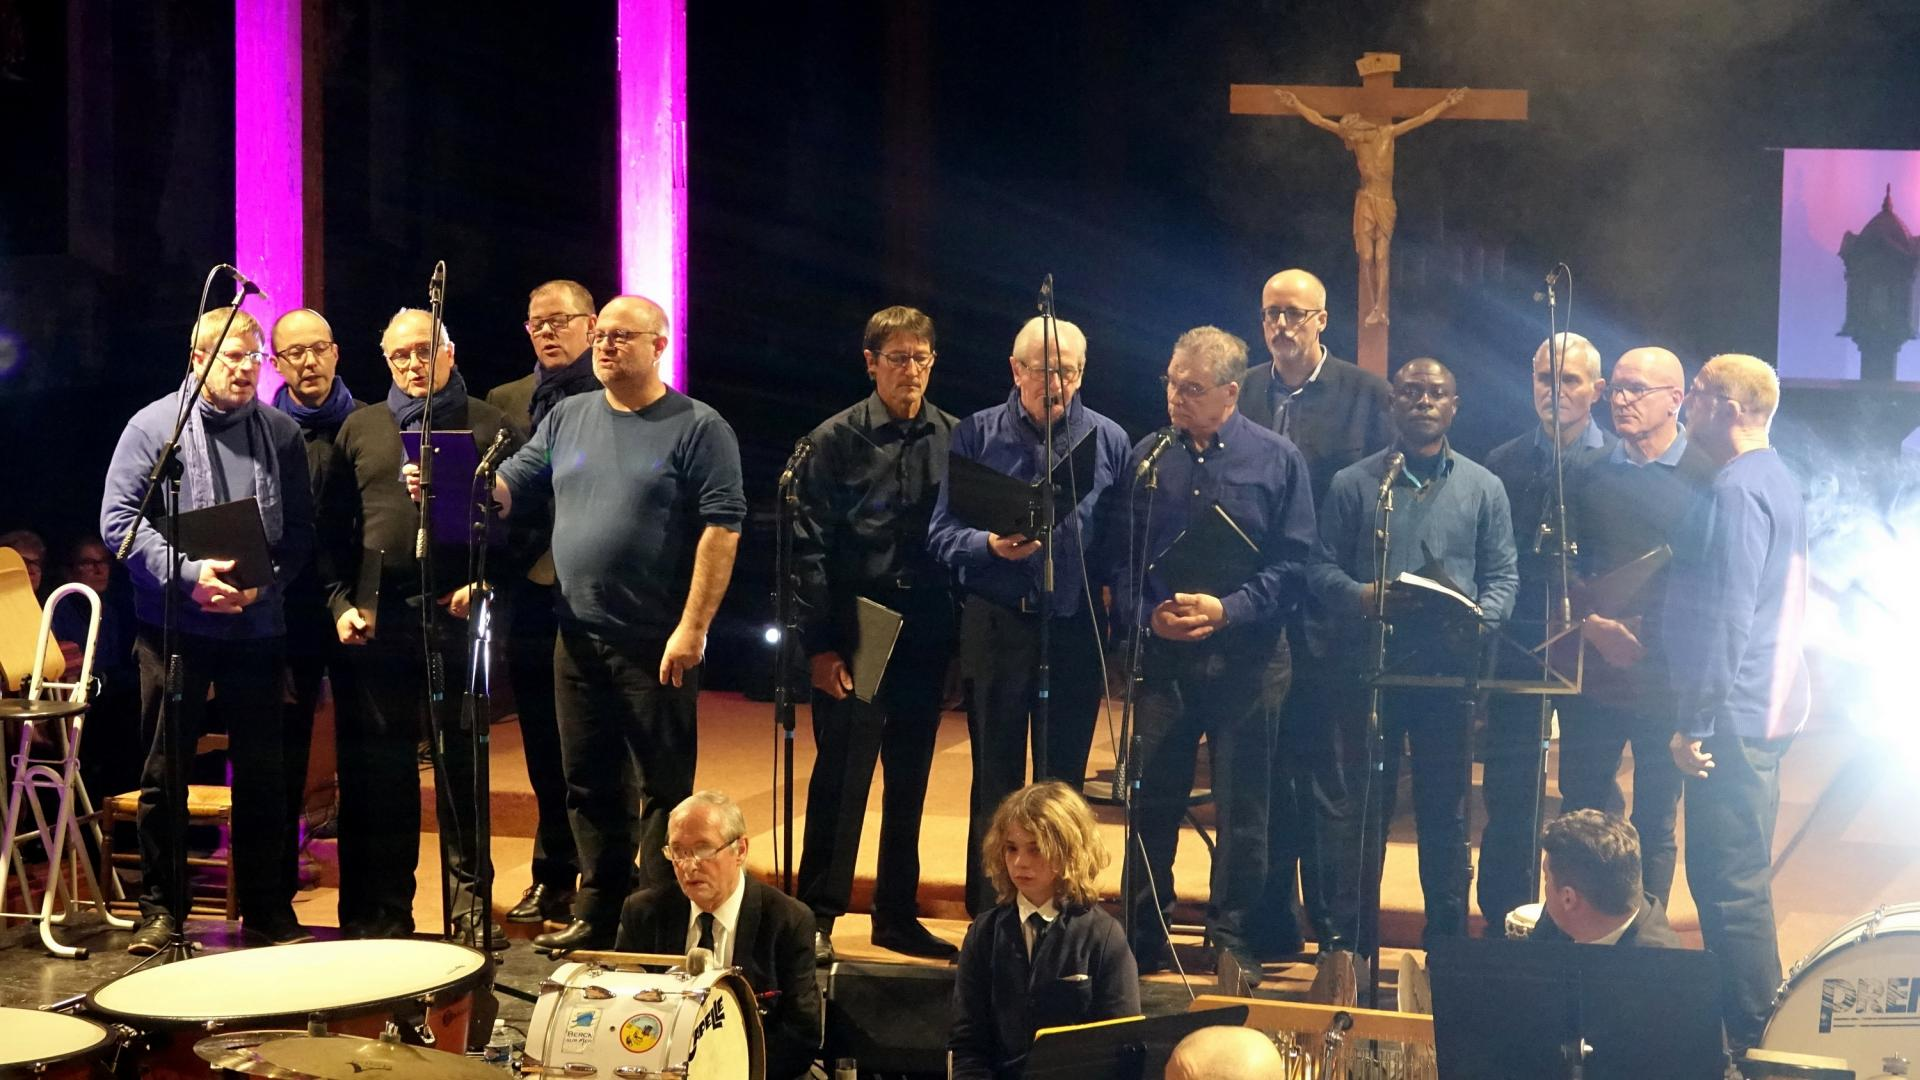 2018-11-09 Concert de l'Armistice